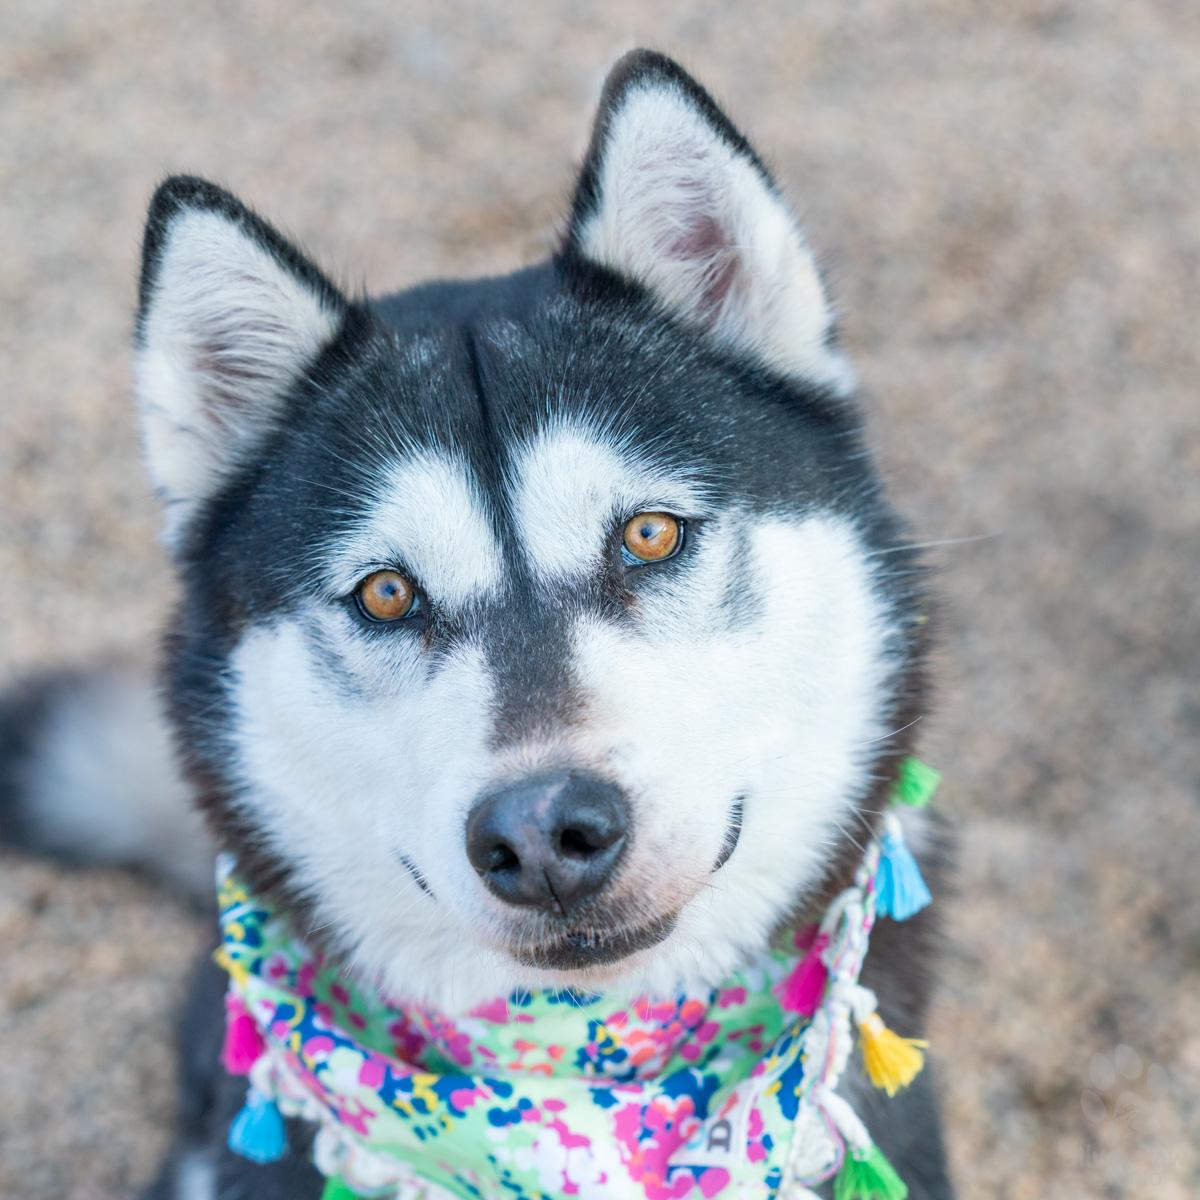 husky dog with golden eyes and colorful bandana